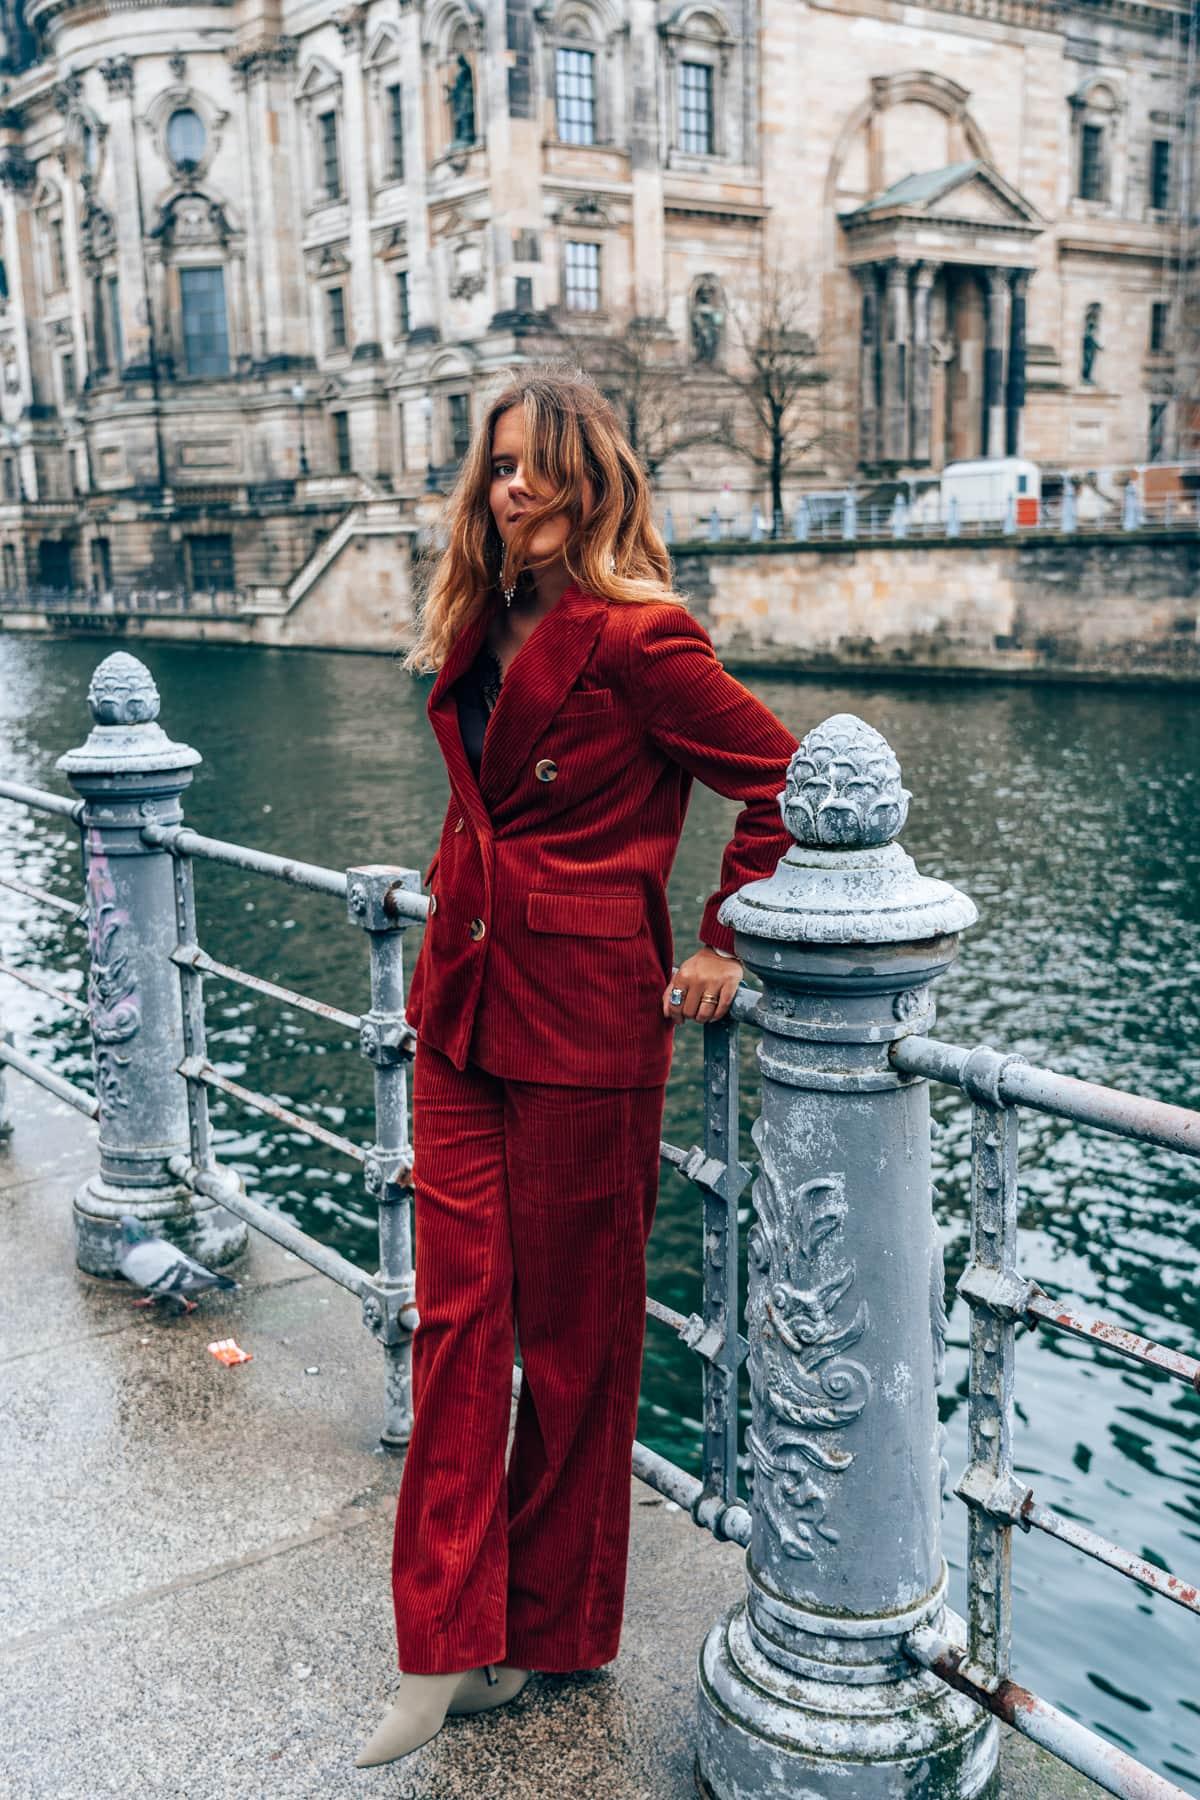 Mein Silvester Outfit 2018 - Roter Kord Anzug von Zara